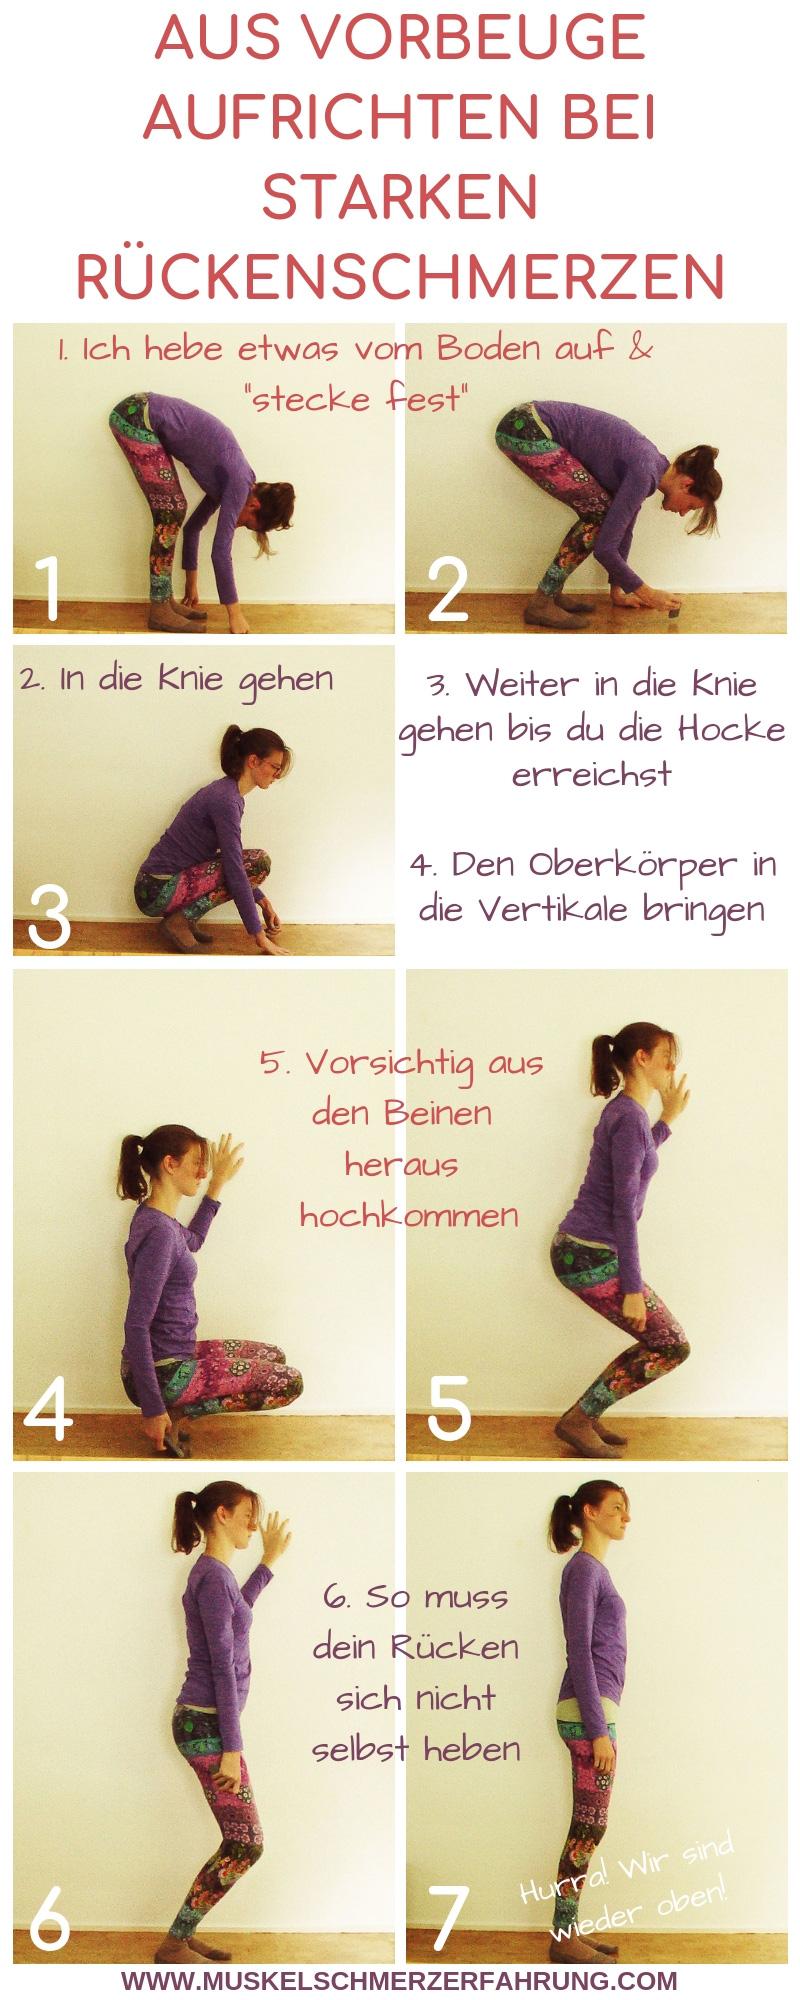 Aus Vorbeuge Aufrichten bei starken Rückenschmerzen Muskelschmerzerfahrung.com Schritt-für-Schritt Anleitung